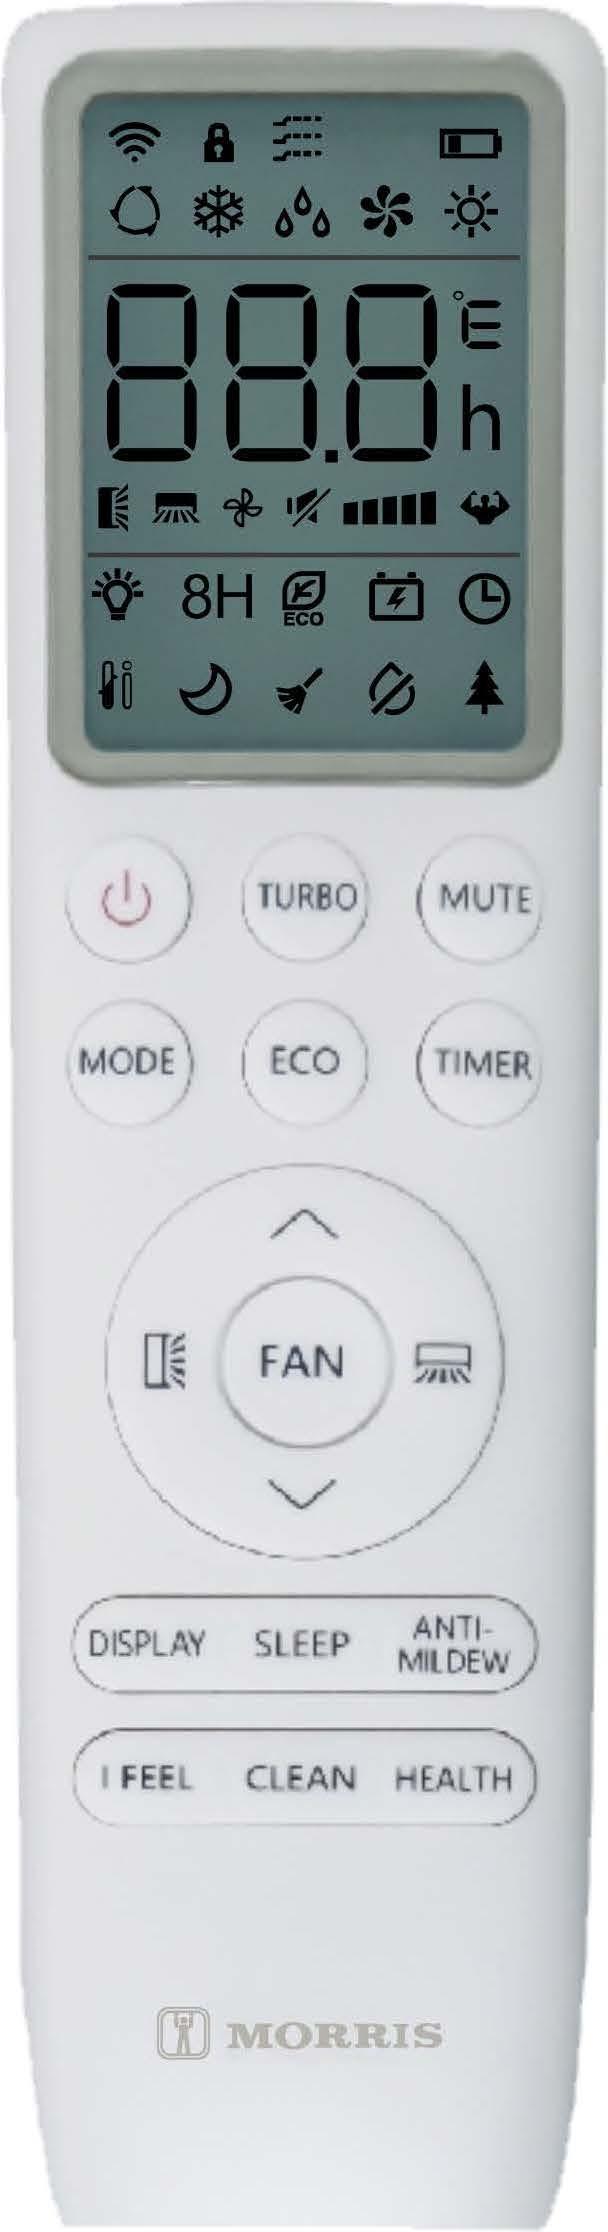 MORRIS WFIN-26152 ΚΛΙΜΑΤΙΣΤΙΚΟ Smart WiFi INVERTER 9000BTU